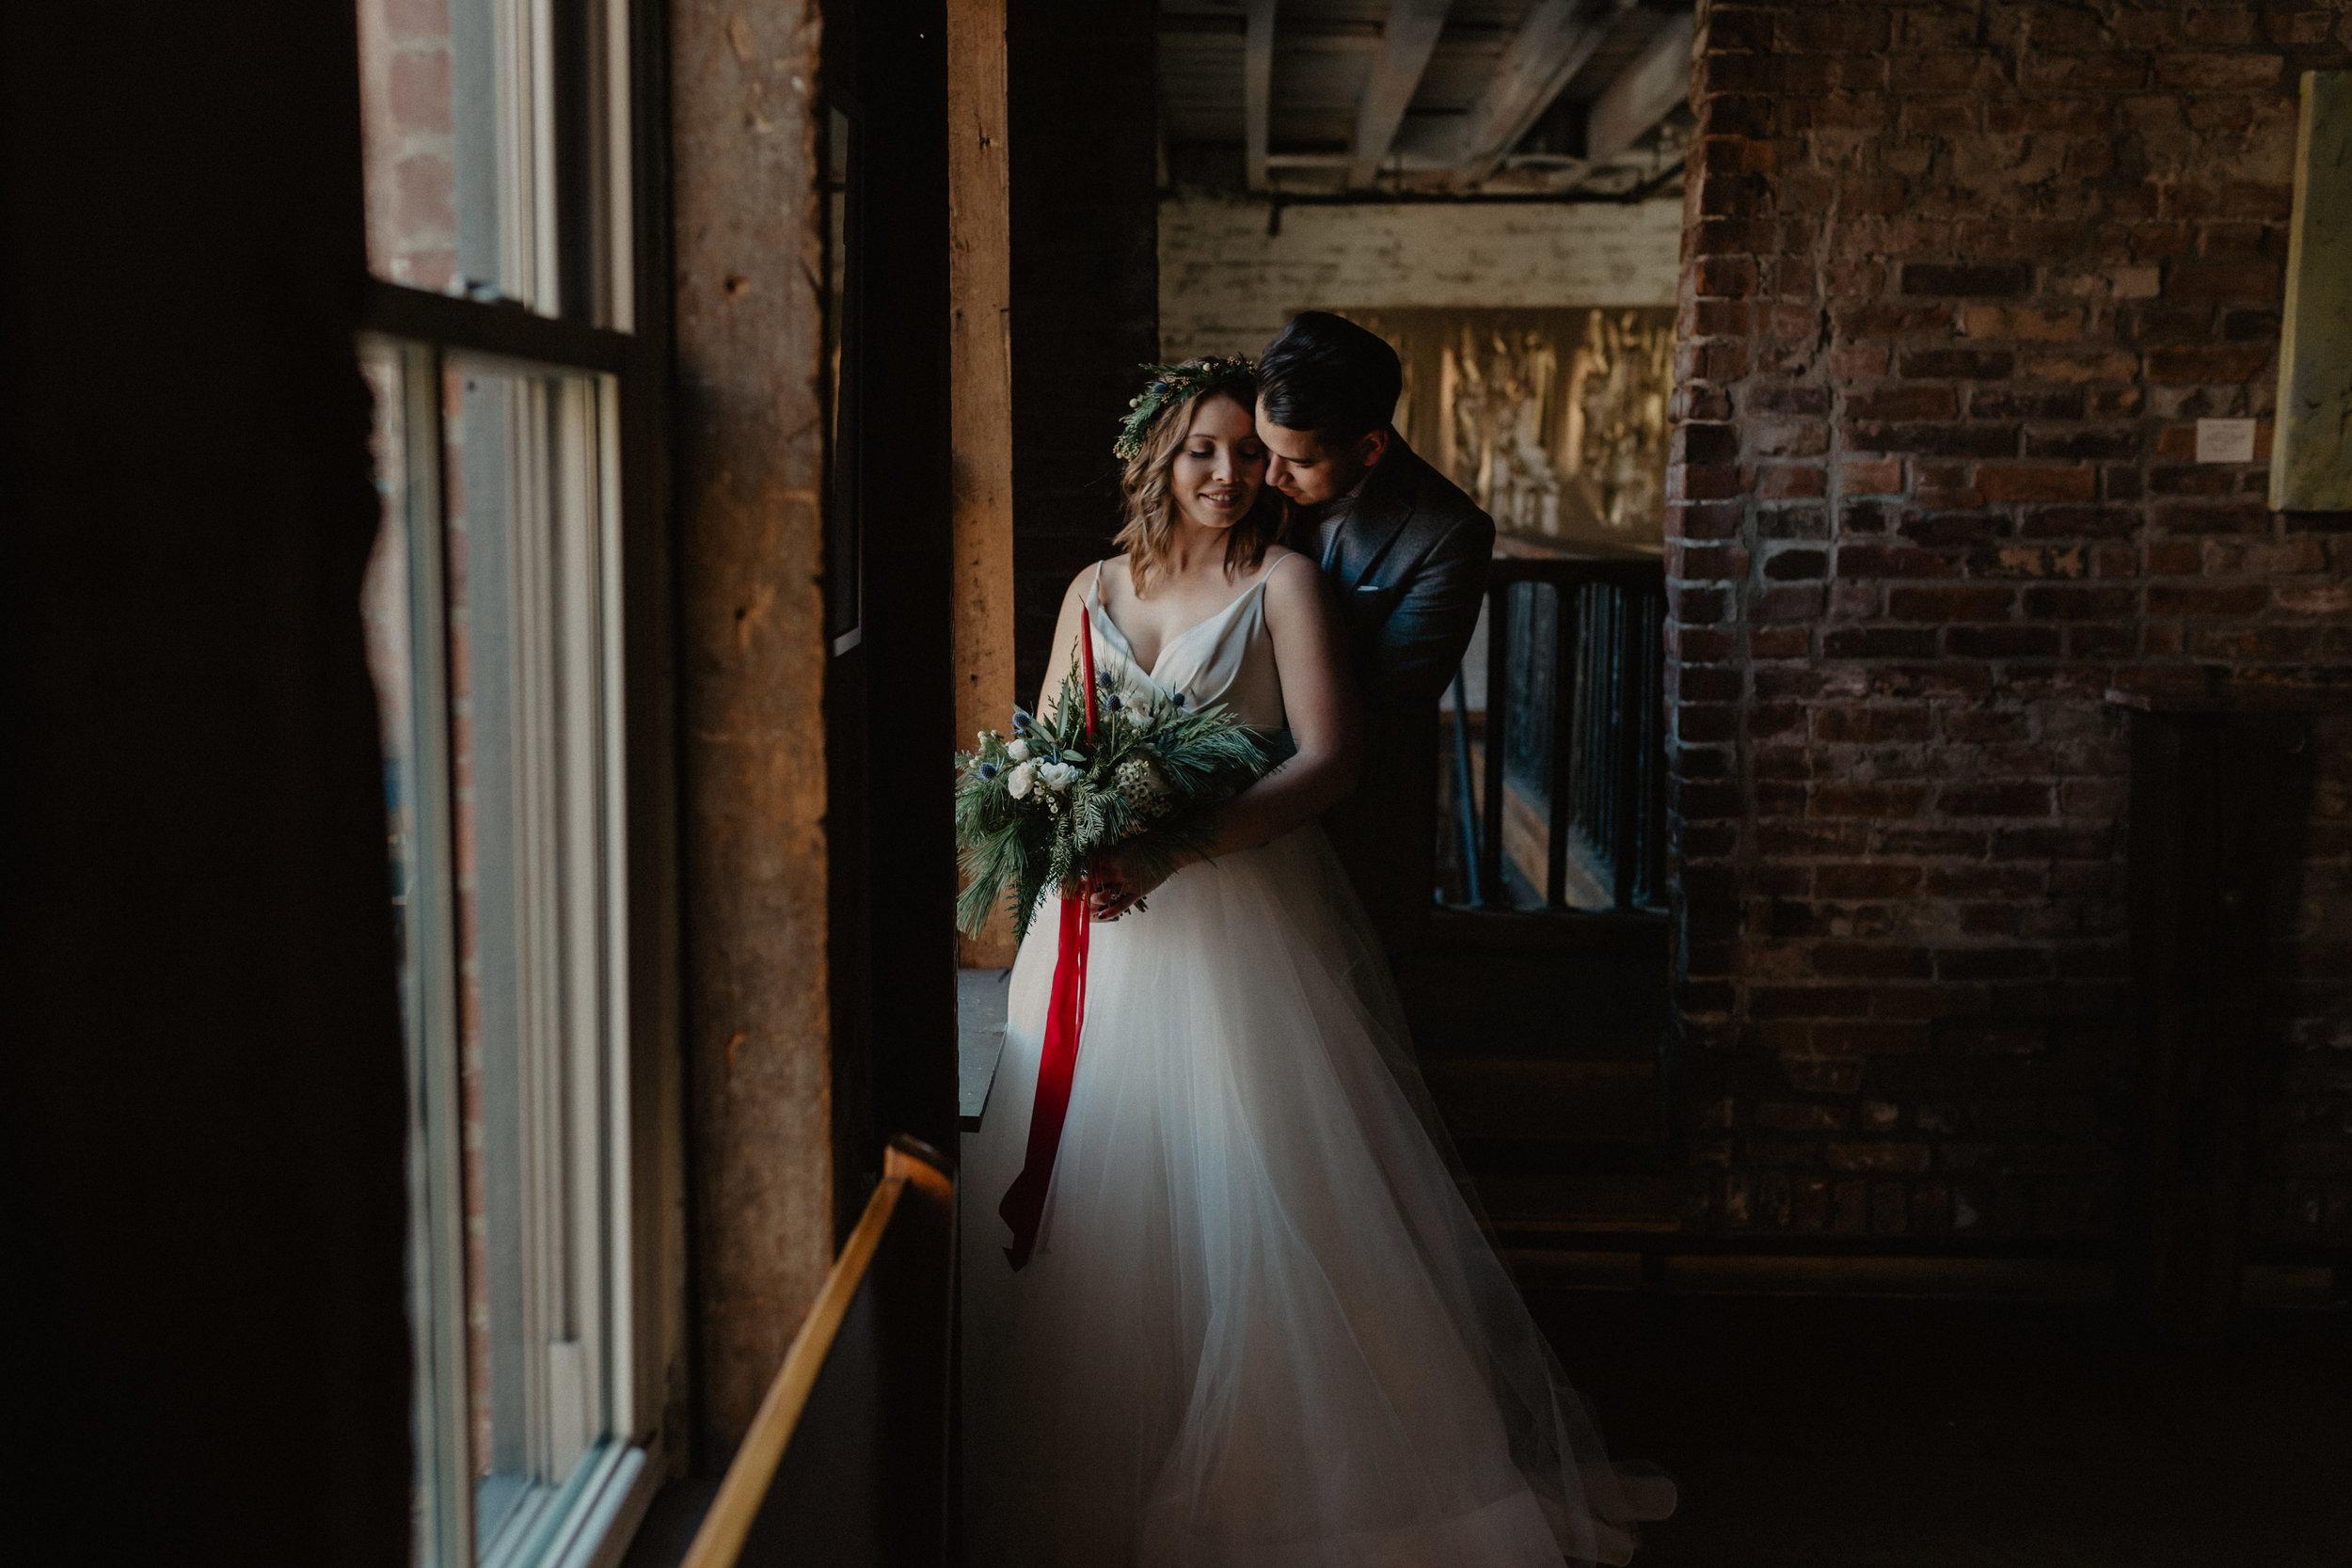 lucas_confectionery_wedding-11.jpg